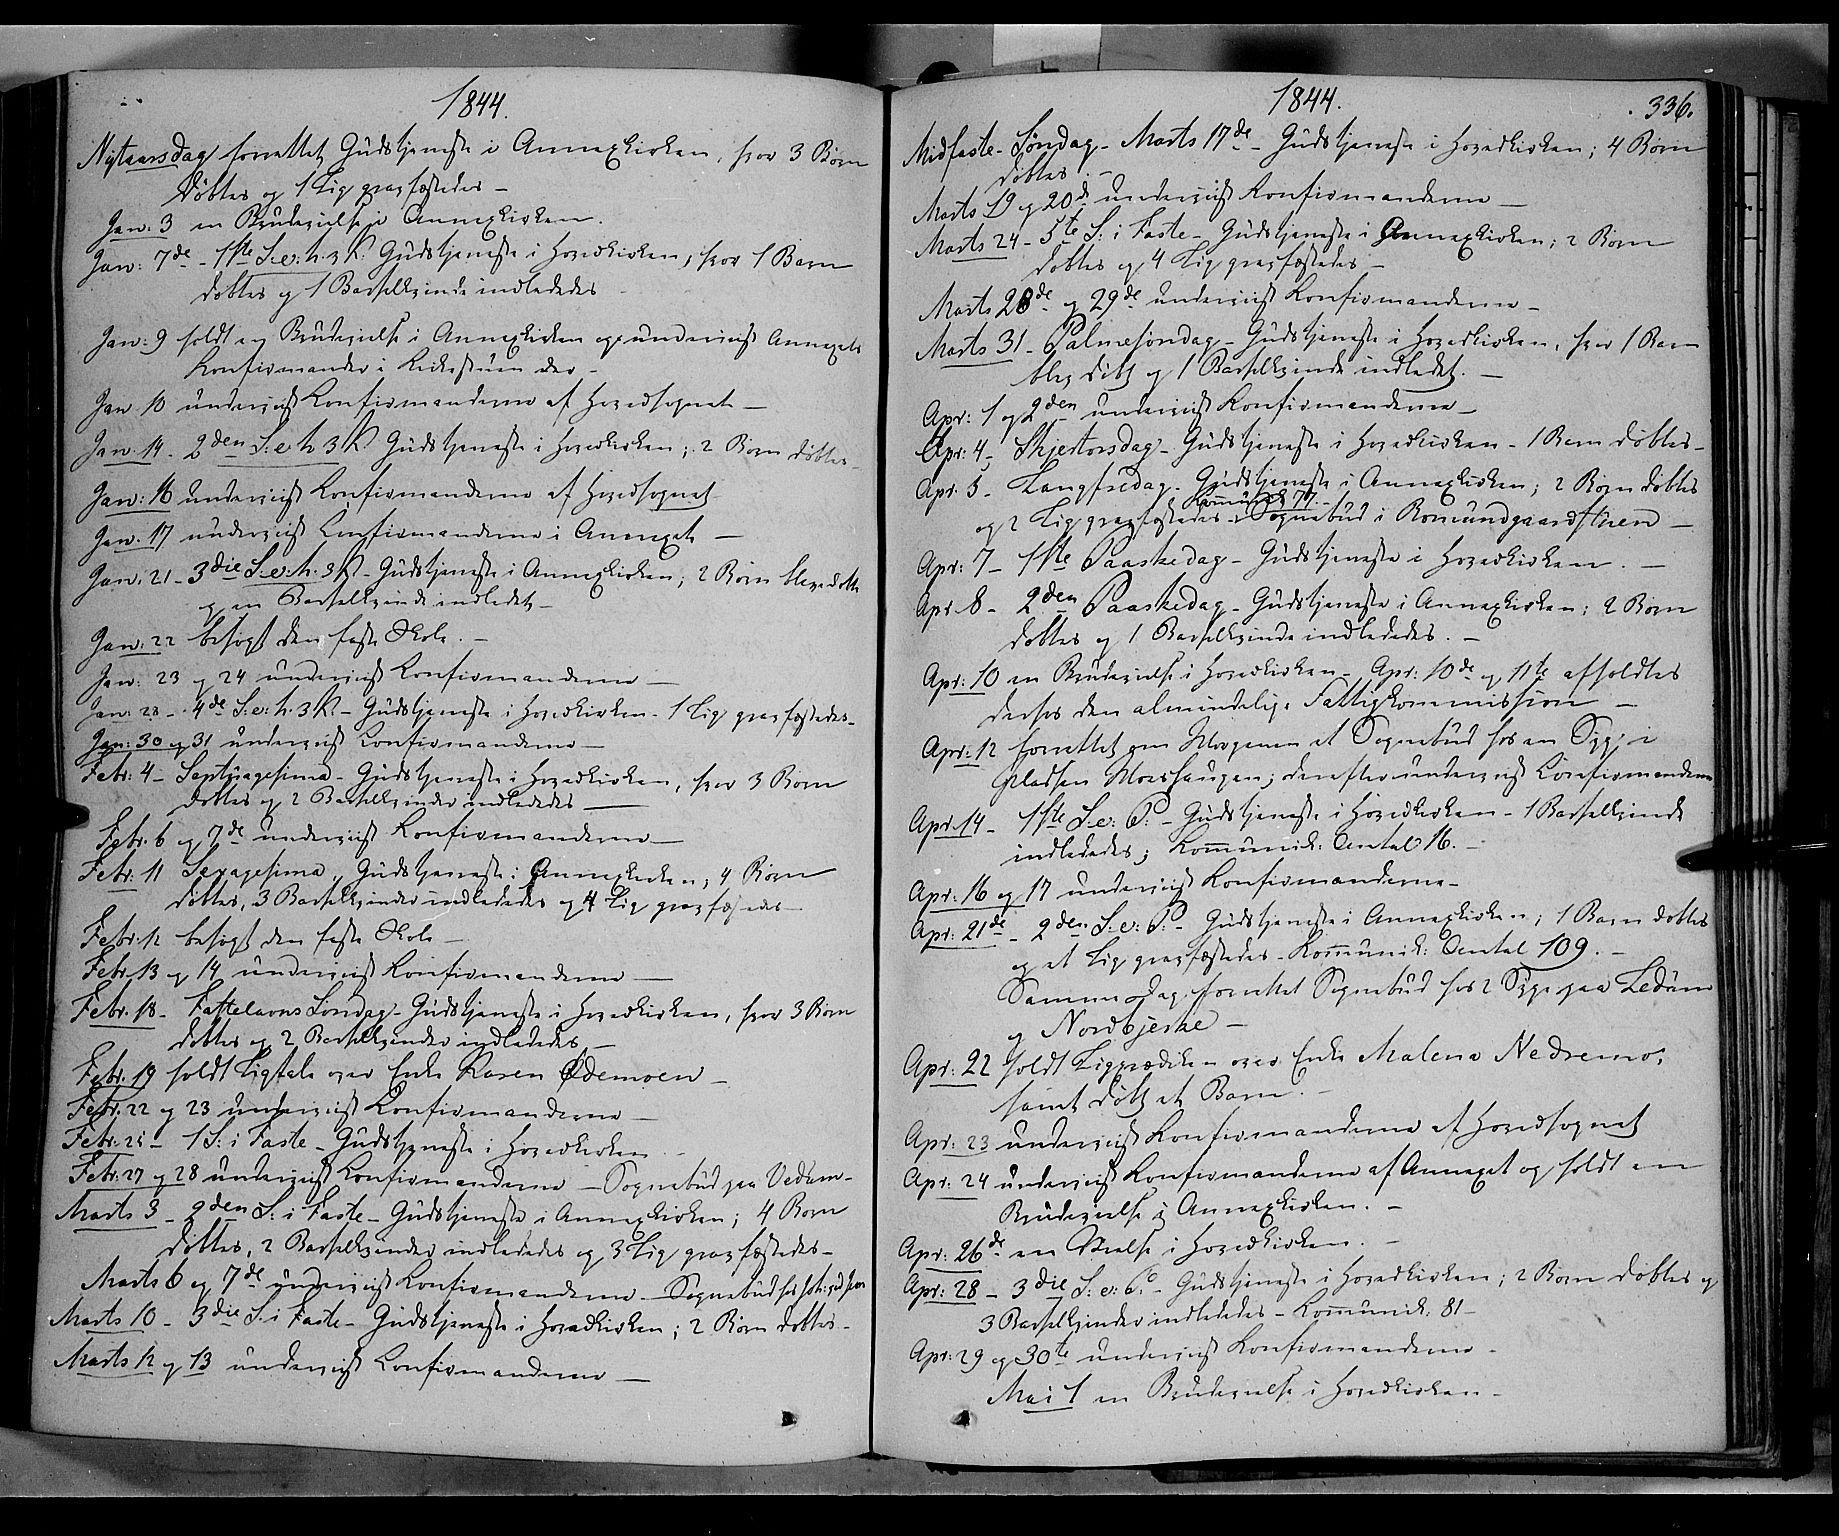 SAH, Øyer prestekontor, Ministerialbok nr. 5, 1842-1857, s. 336